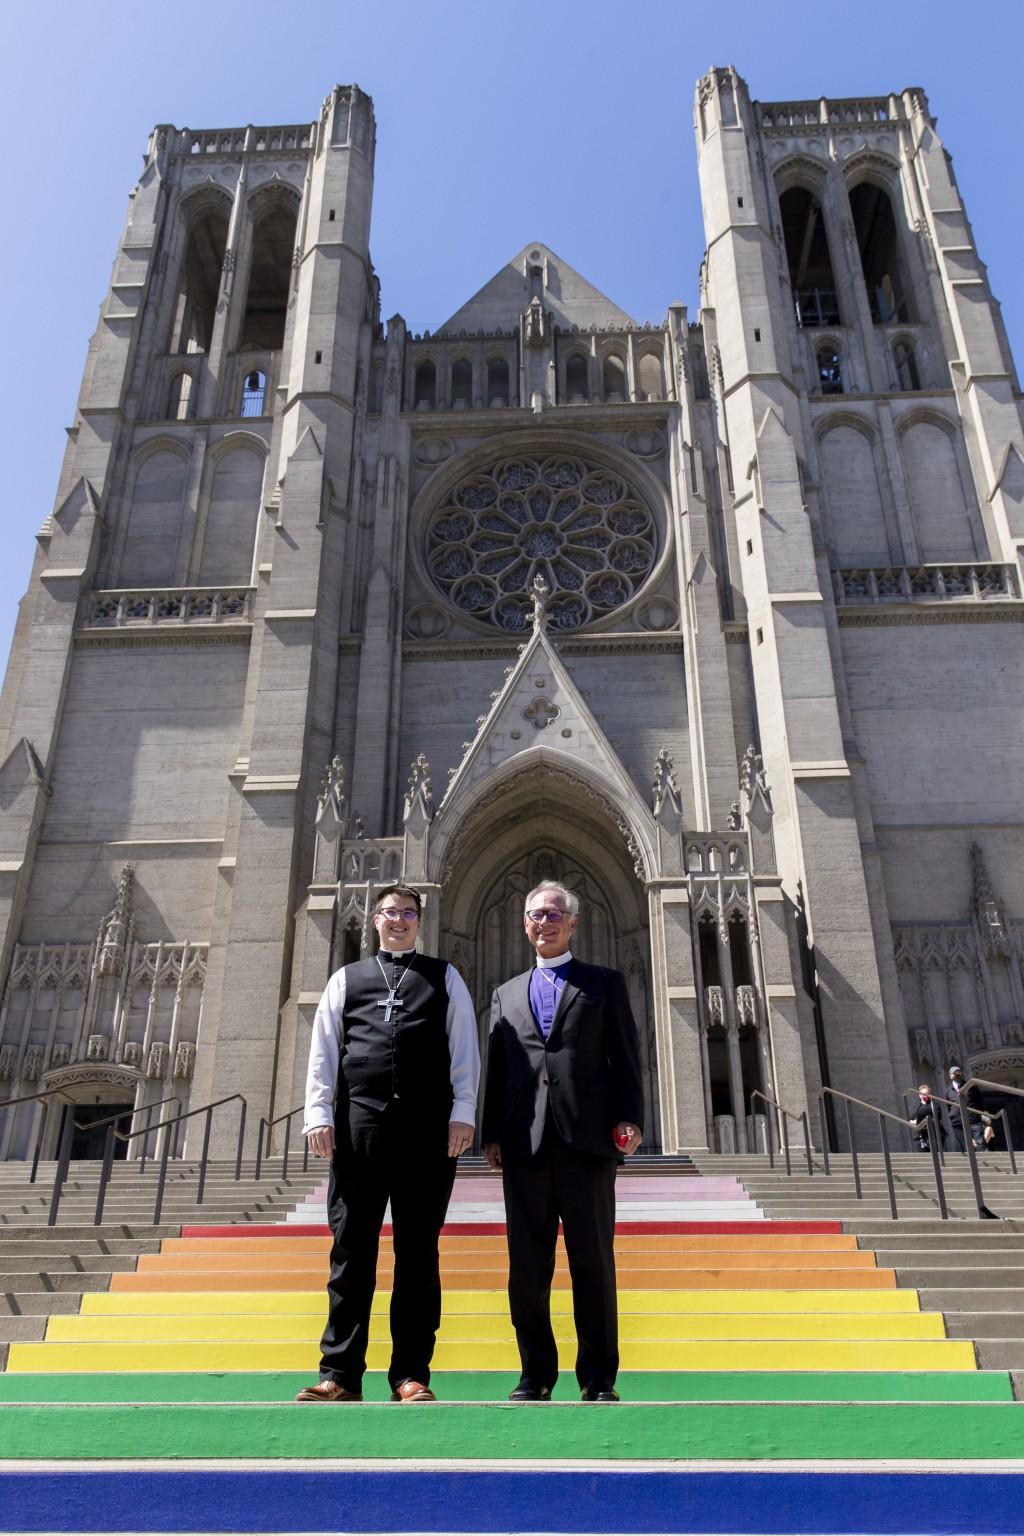 Bishop Megan Rohrer, left, and Bishop Marc Andrus stand on the rainbow steps before Bishop Rohrer's installation ceremony at Grace Cathedral in San Fr...